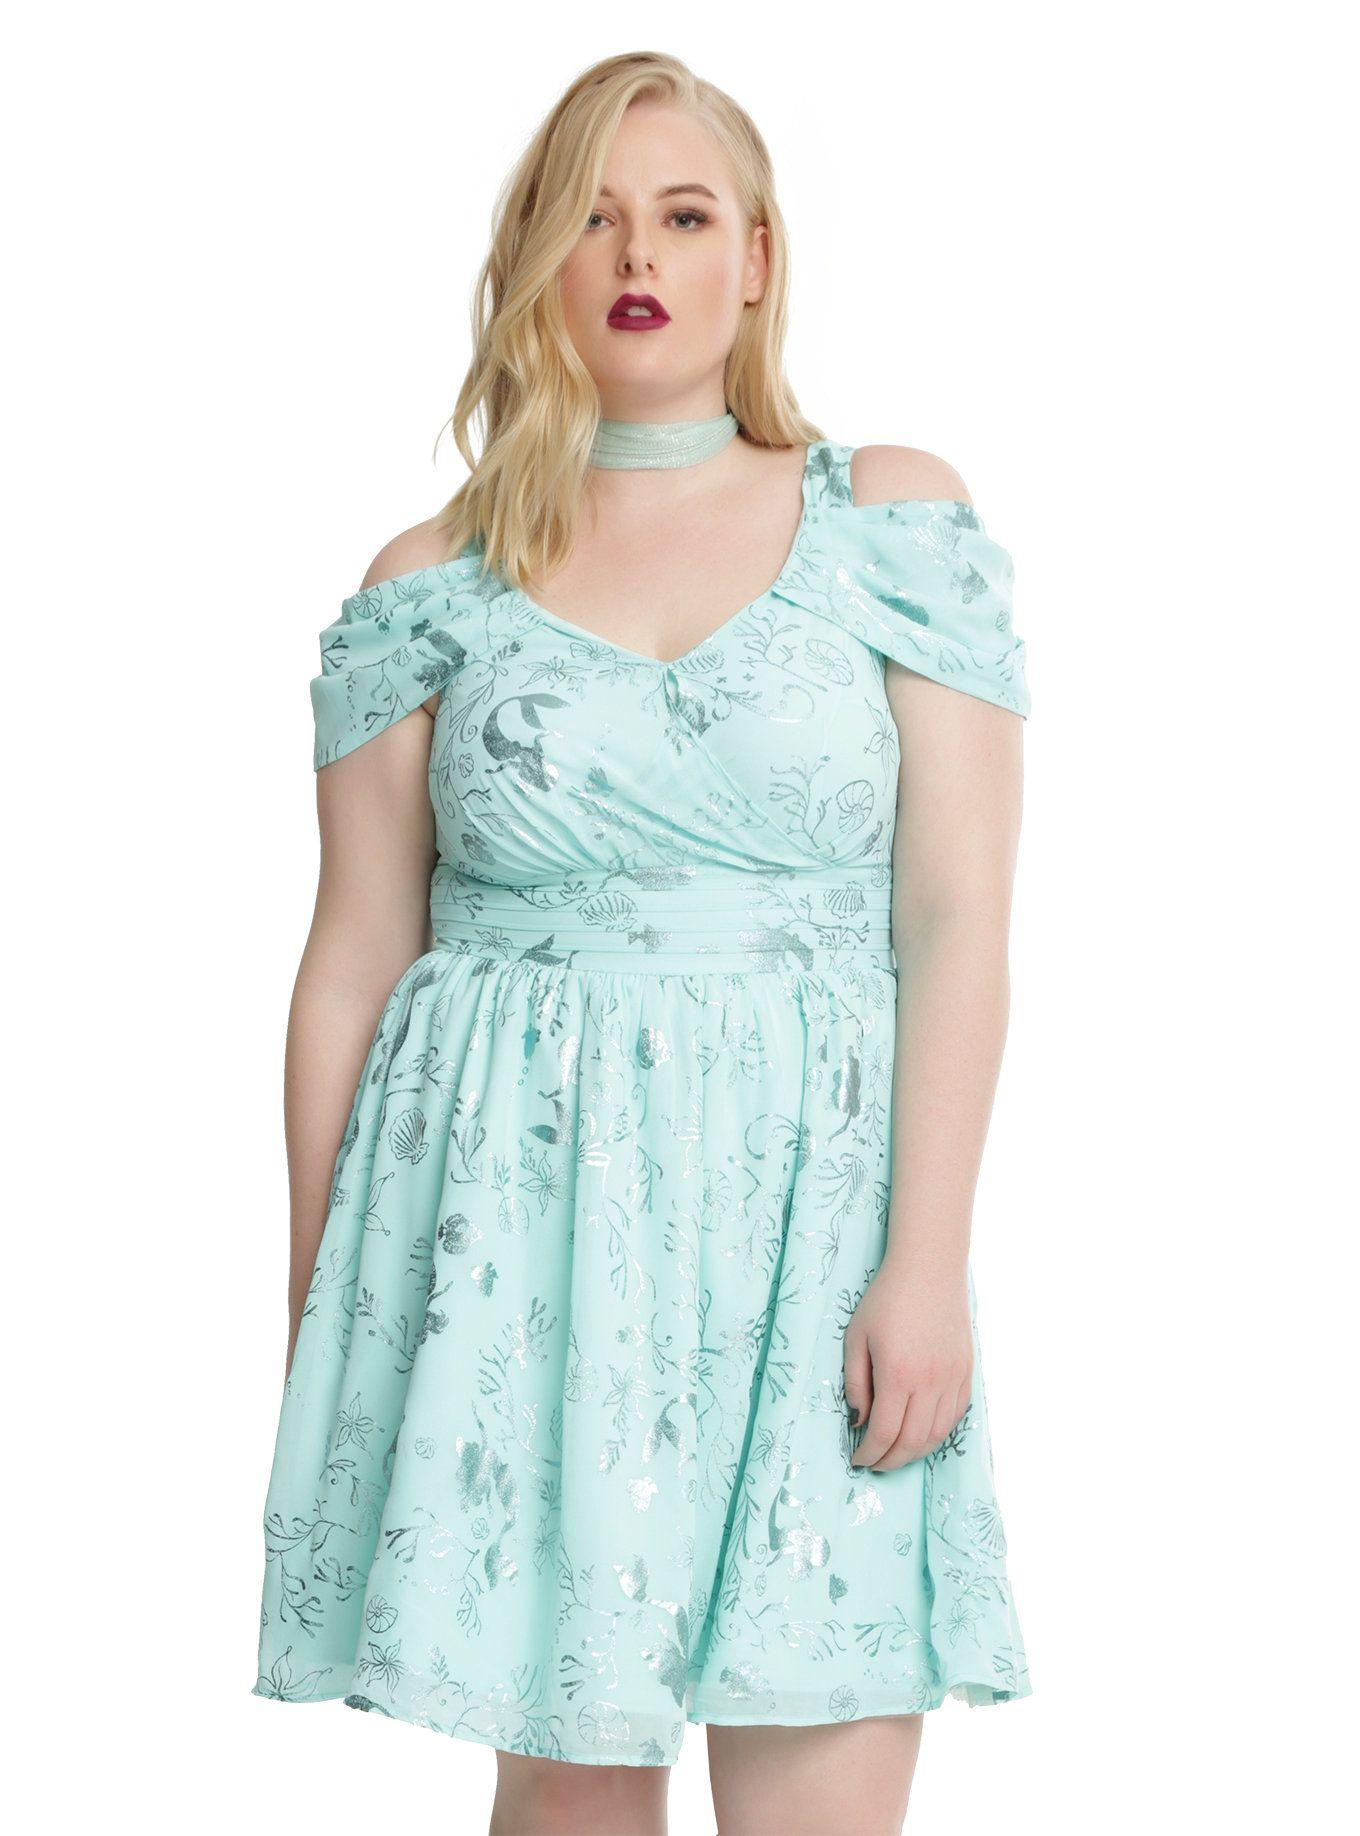 Disney the little mermaid ariel green princess dress plus